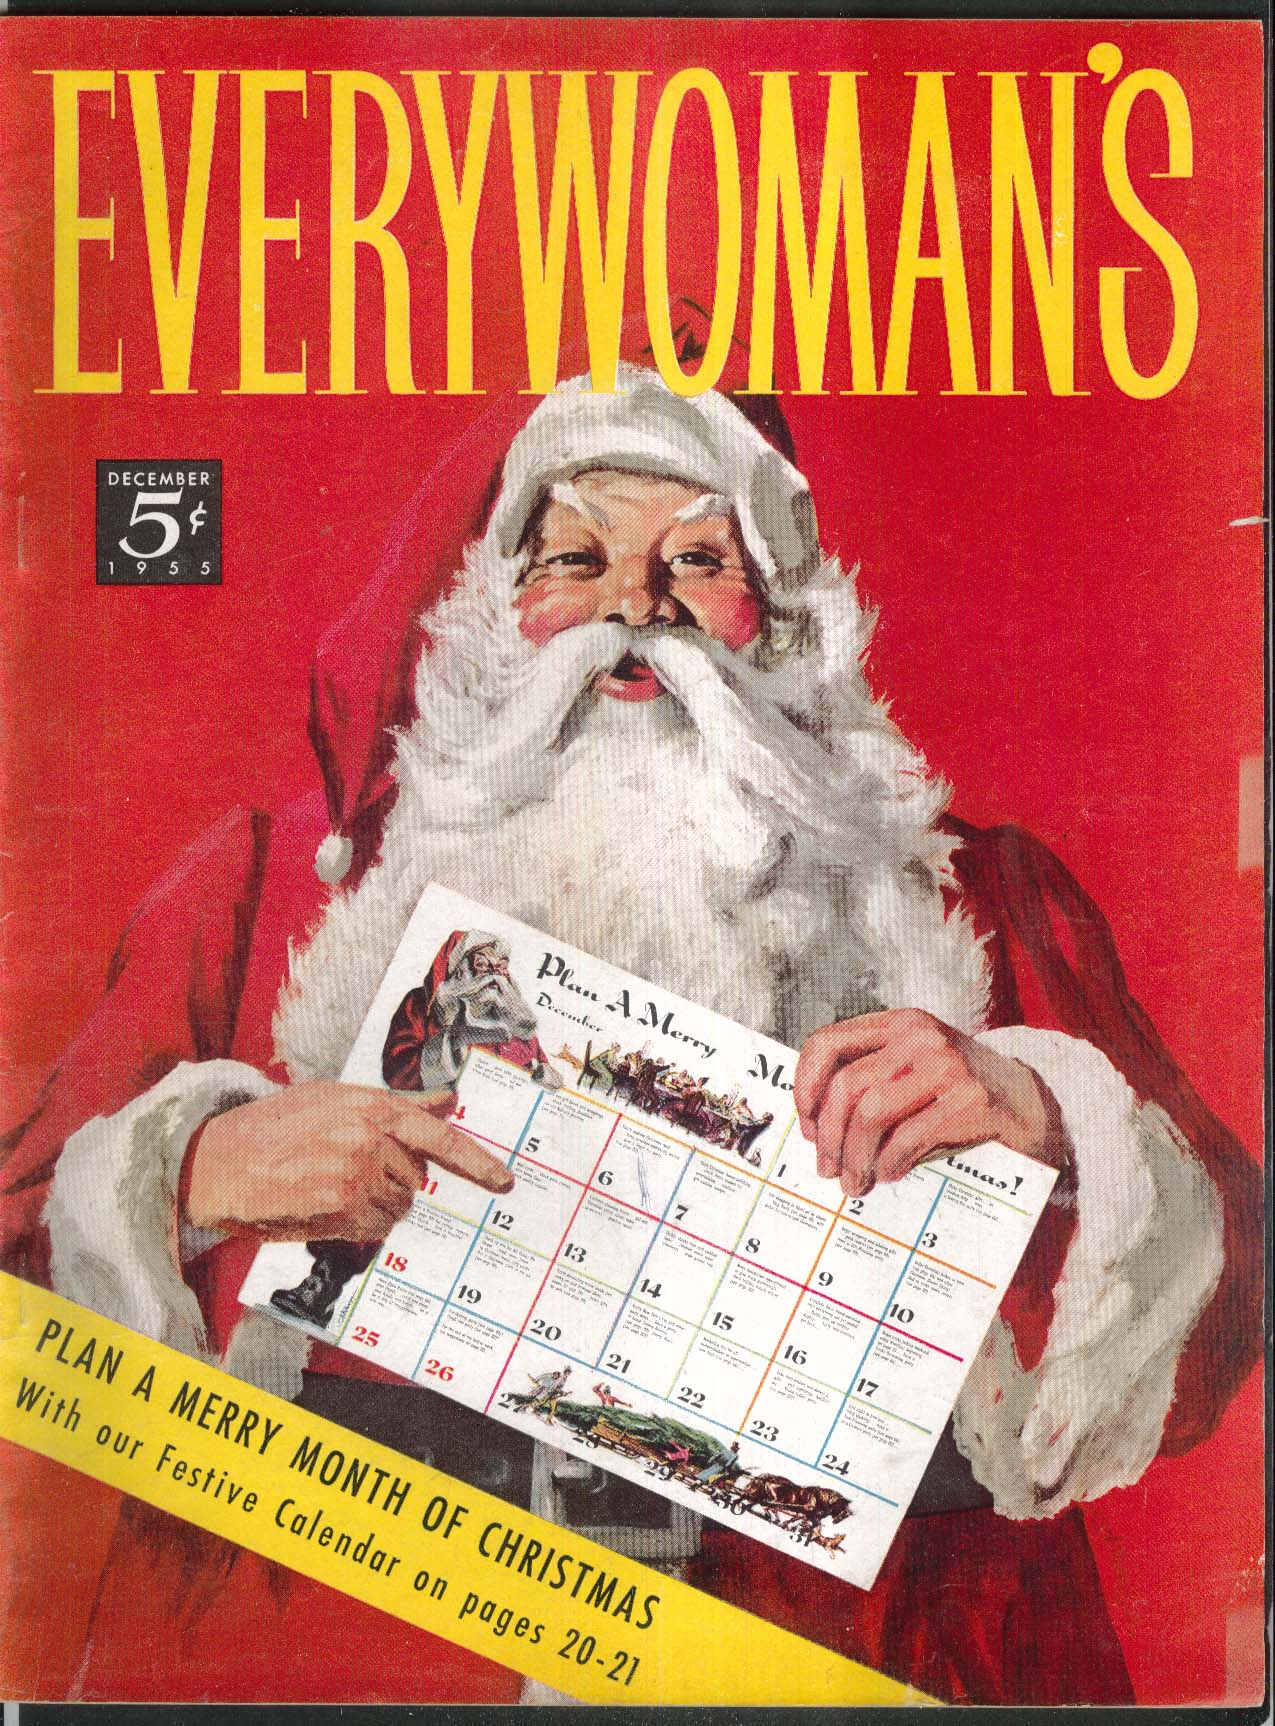 EVERYWOMAN'S Christmas Santa Claus Central Park Turkey Hash ++ 12 1955